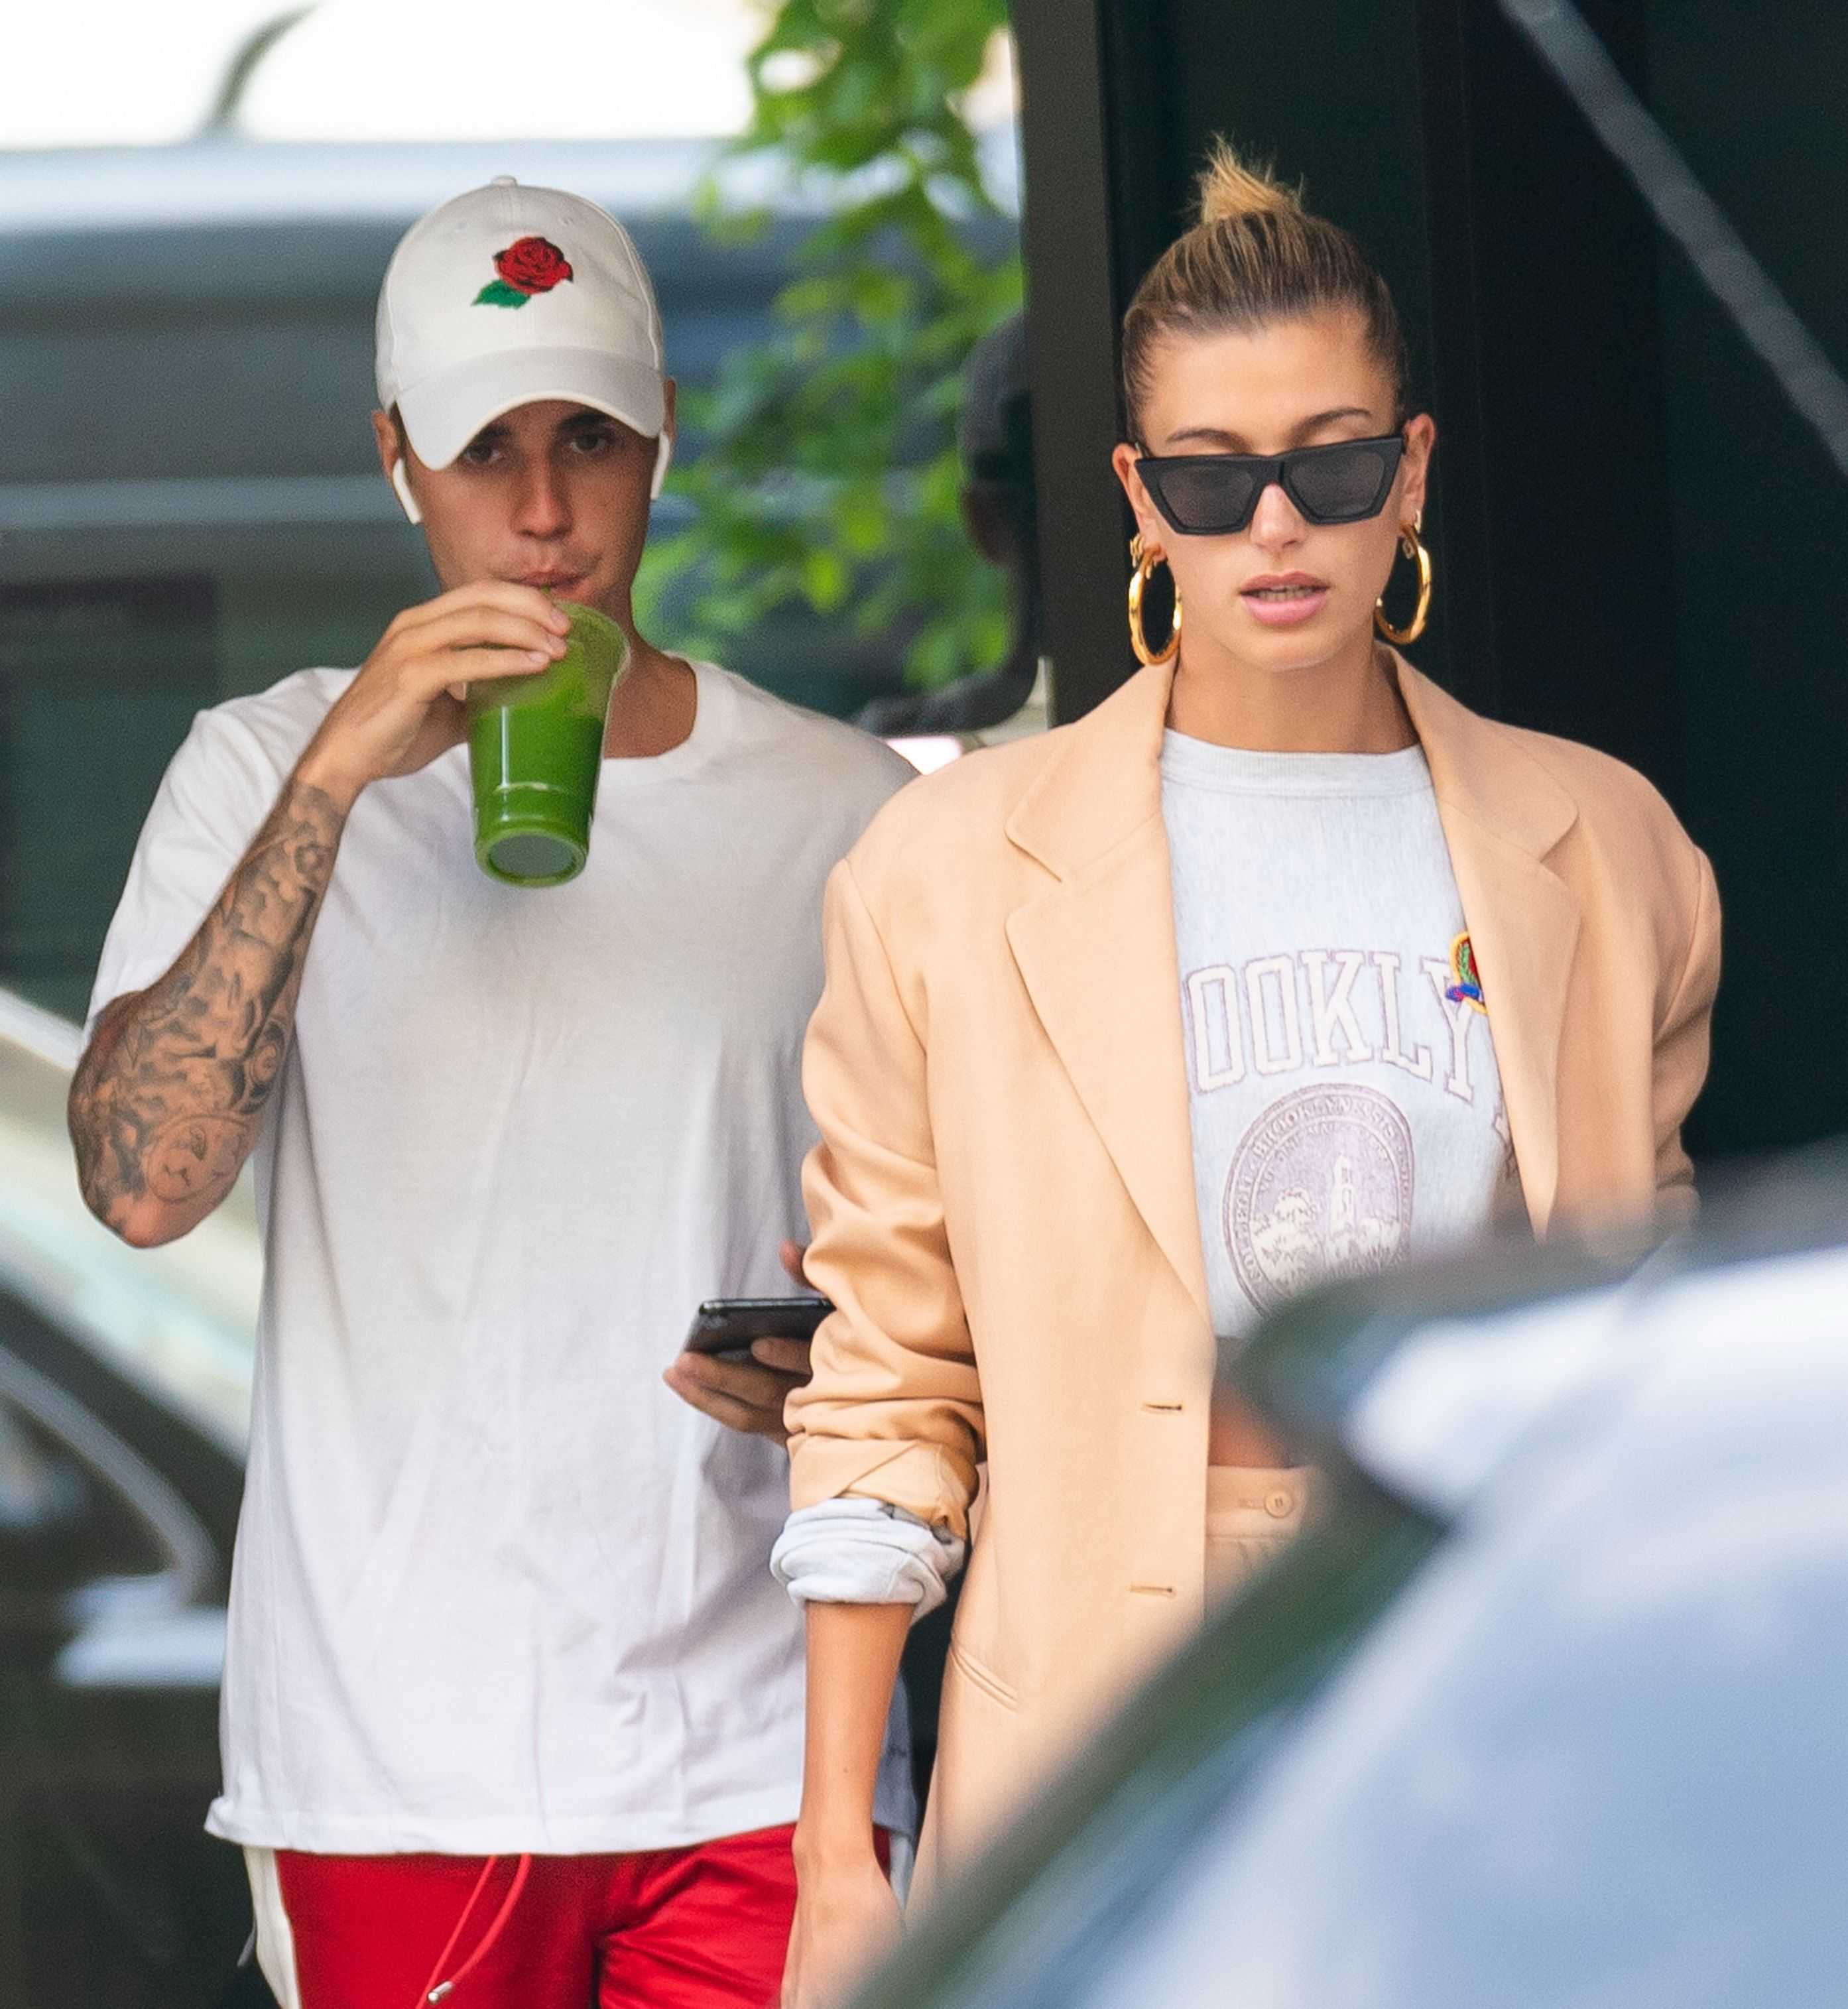 Justin Bieber dating noen veldig dårlig blagues quand på EST un hastighet dating